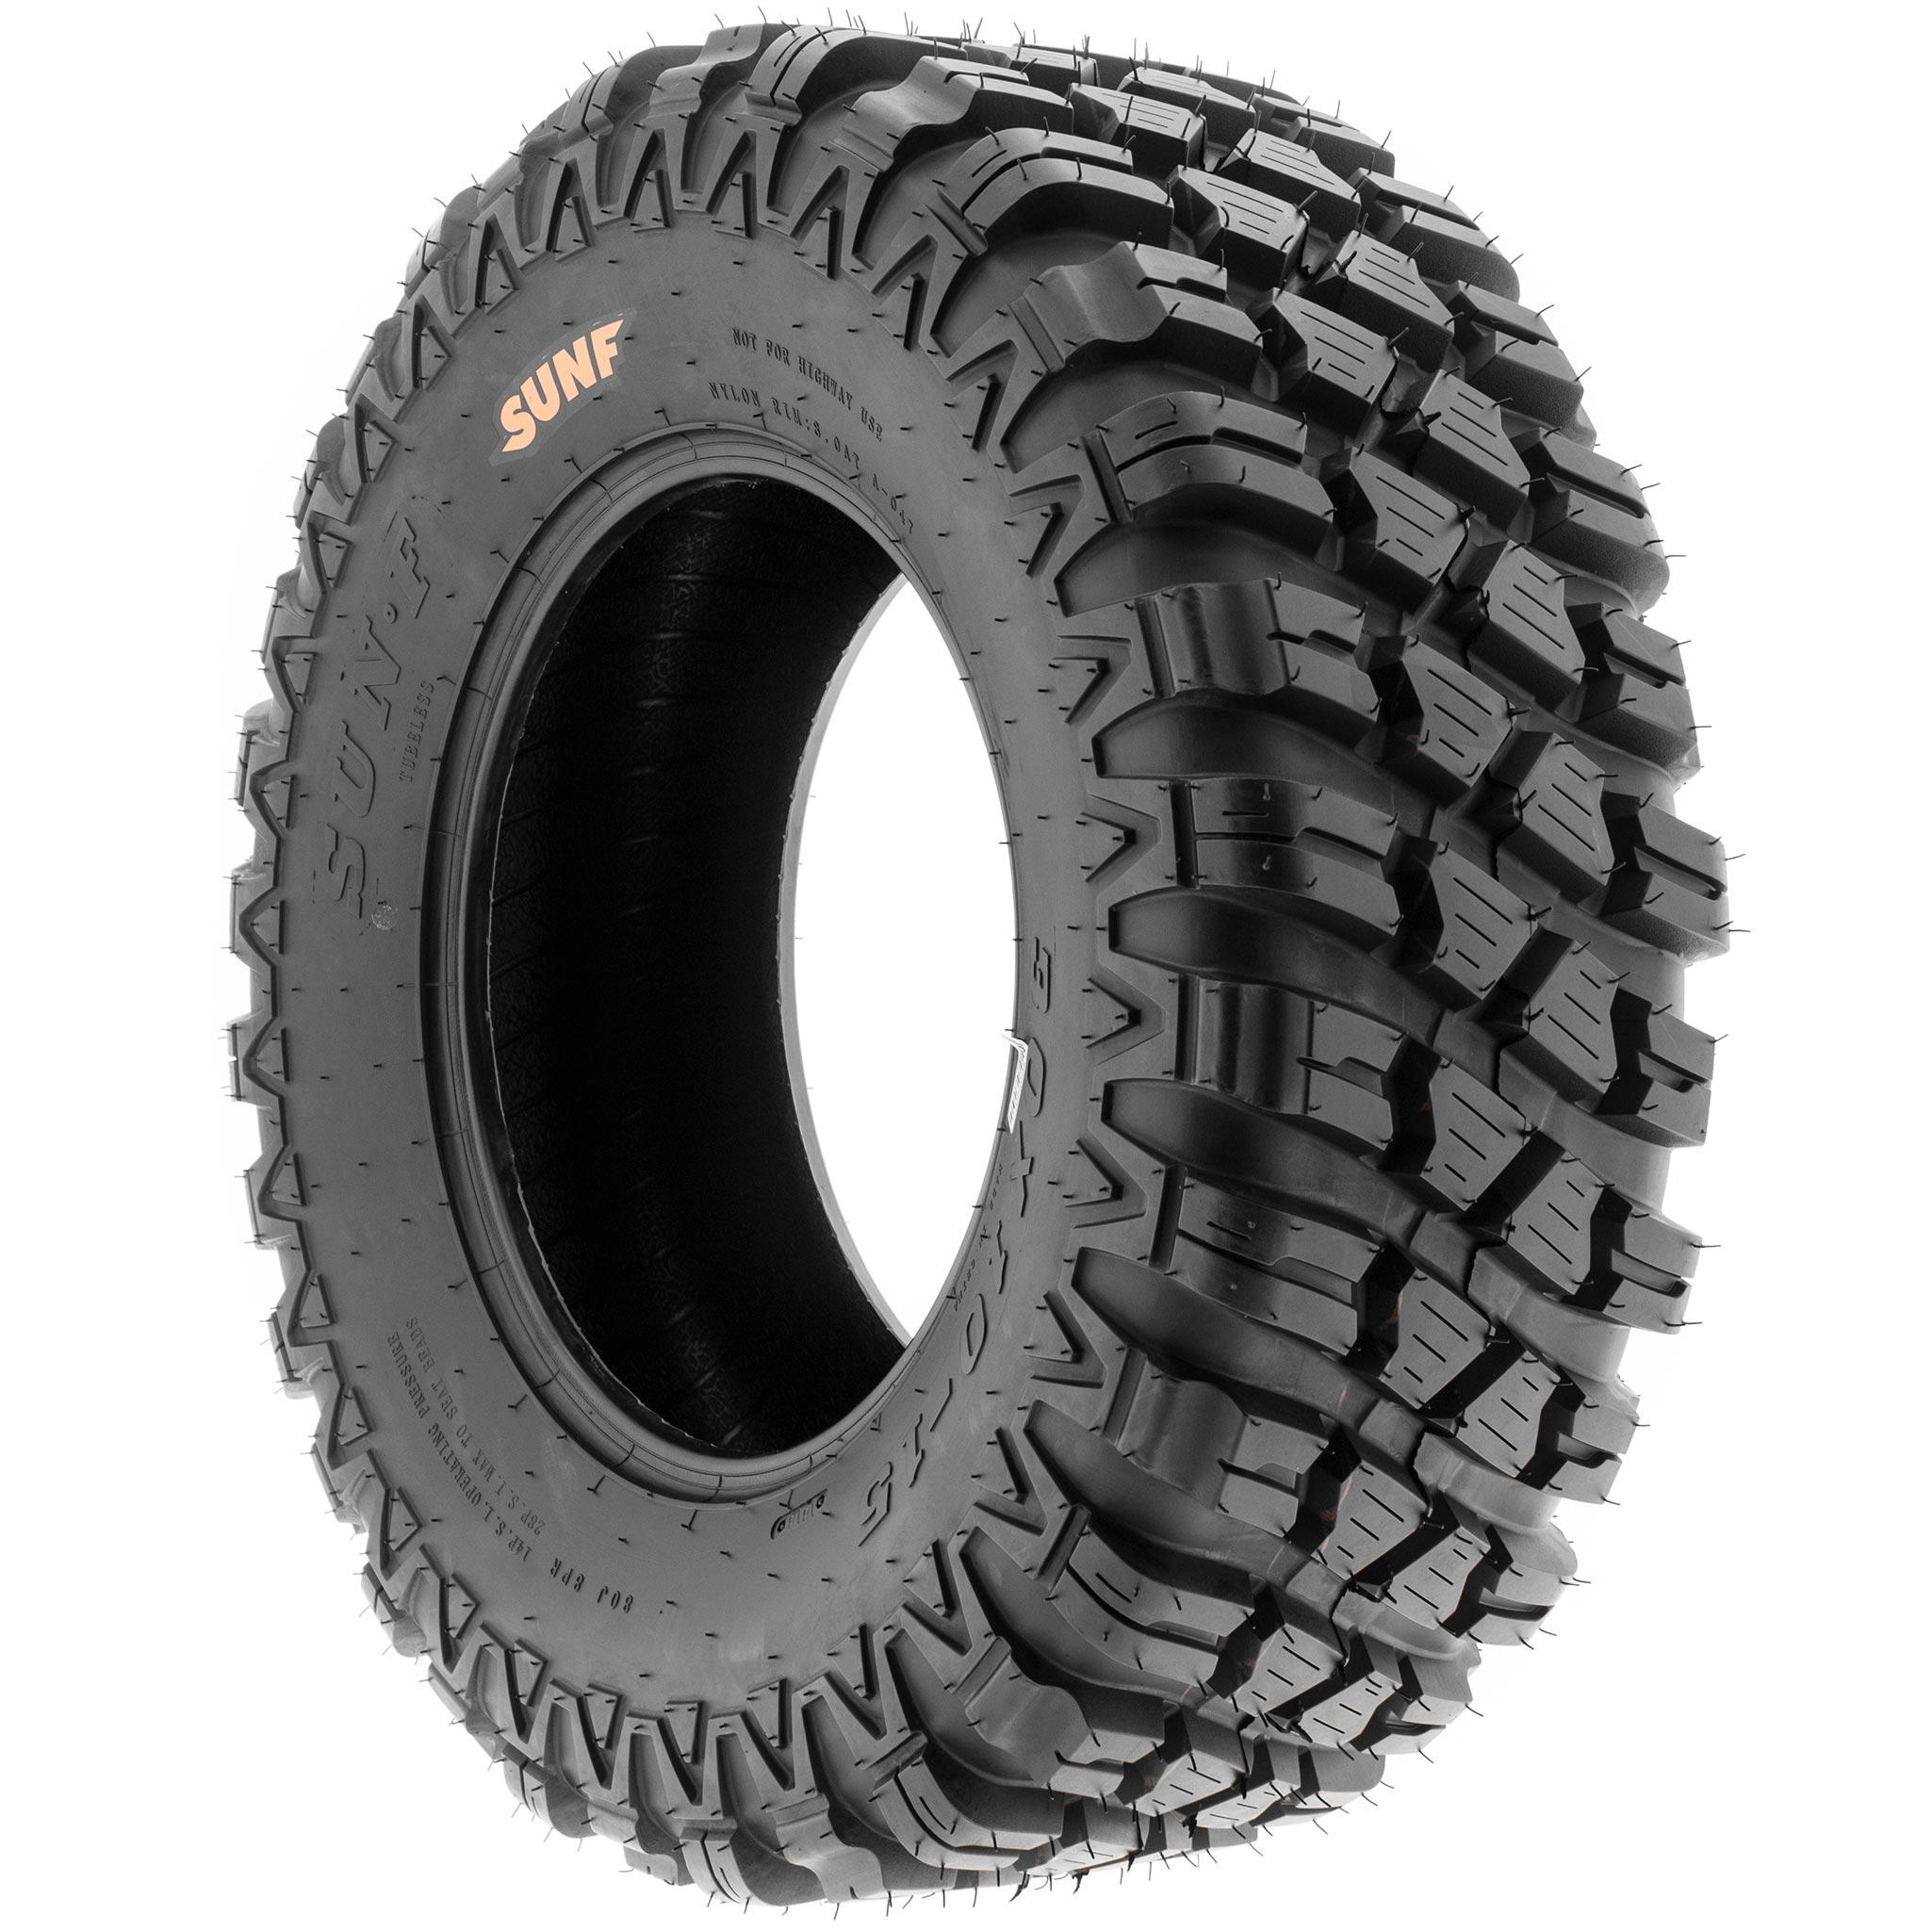 Single SunF A043  All Terrain ATV UTV Tubeless Tires